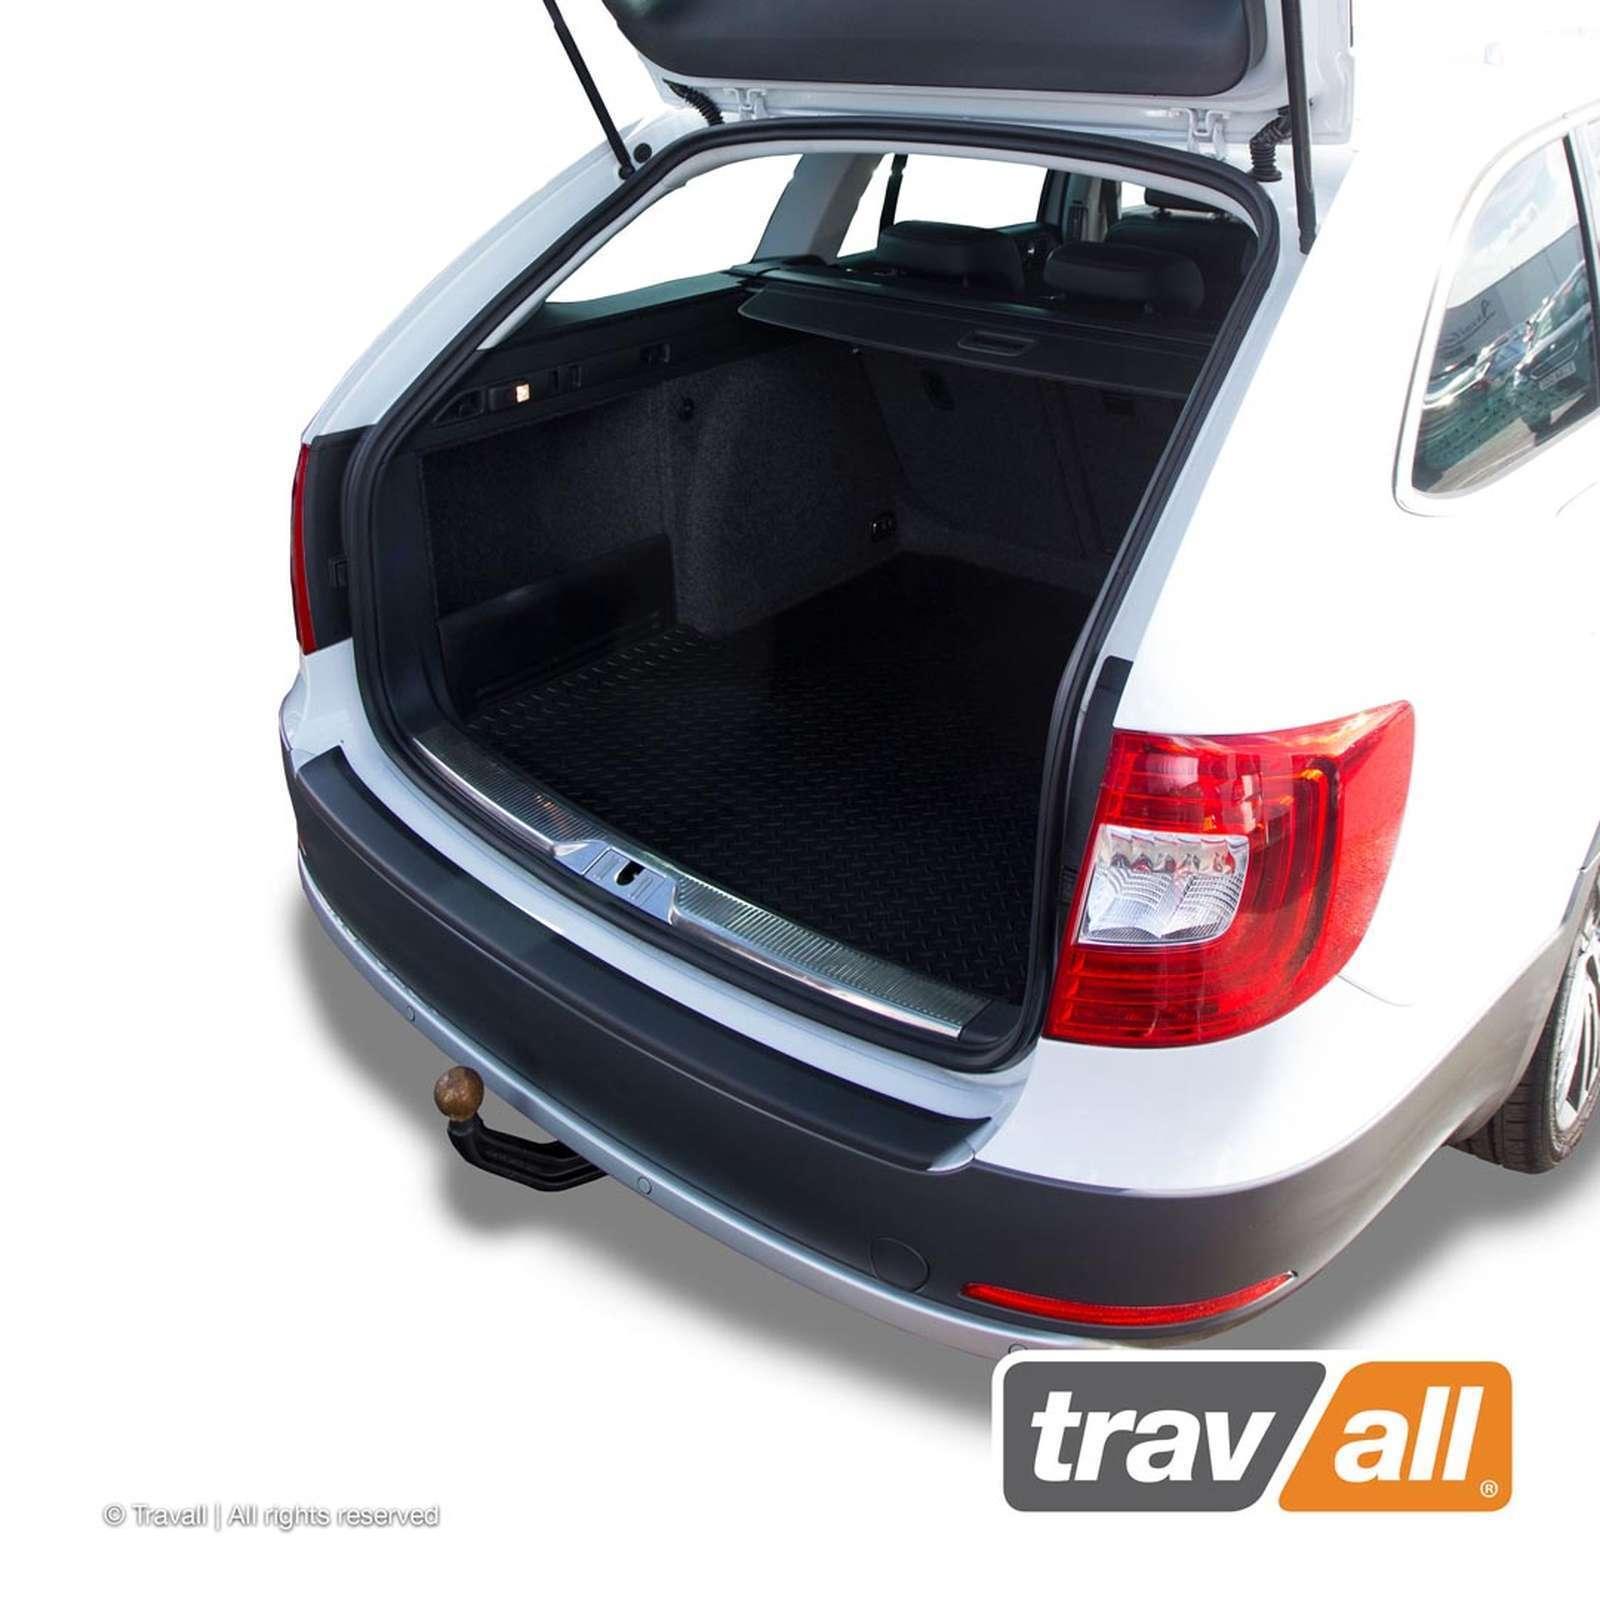 Skoda Superb Combi Estate Travall Bumper Protector 2015 Black Plastic Vehicle Parts Accessories Bumper Strip